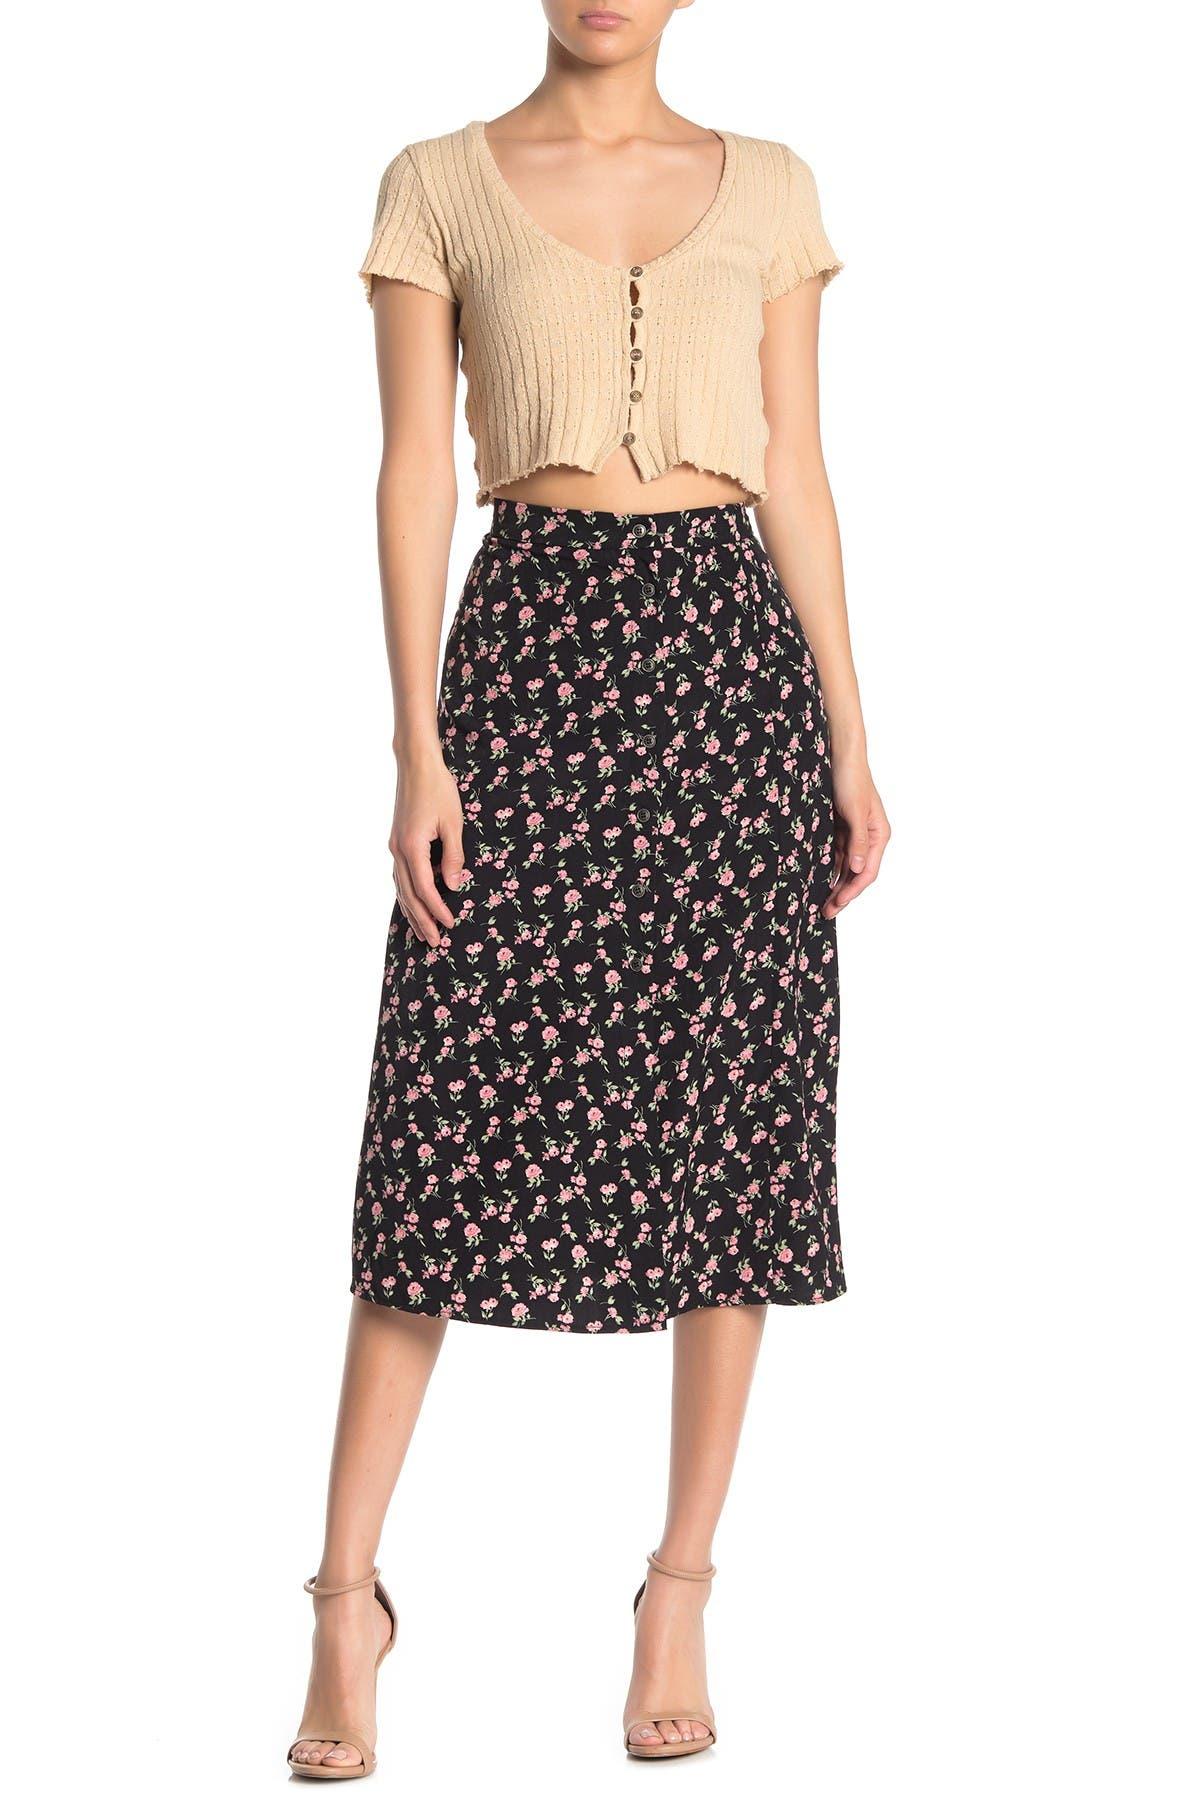 Image of GOOD LUCK GEM Printed Side Button Midi Skirt